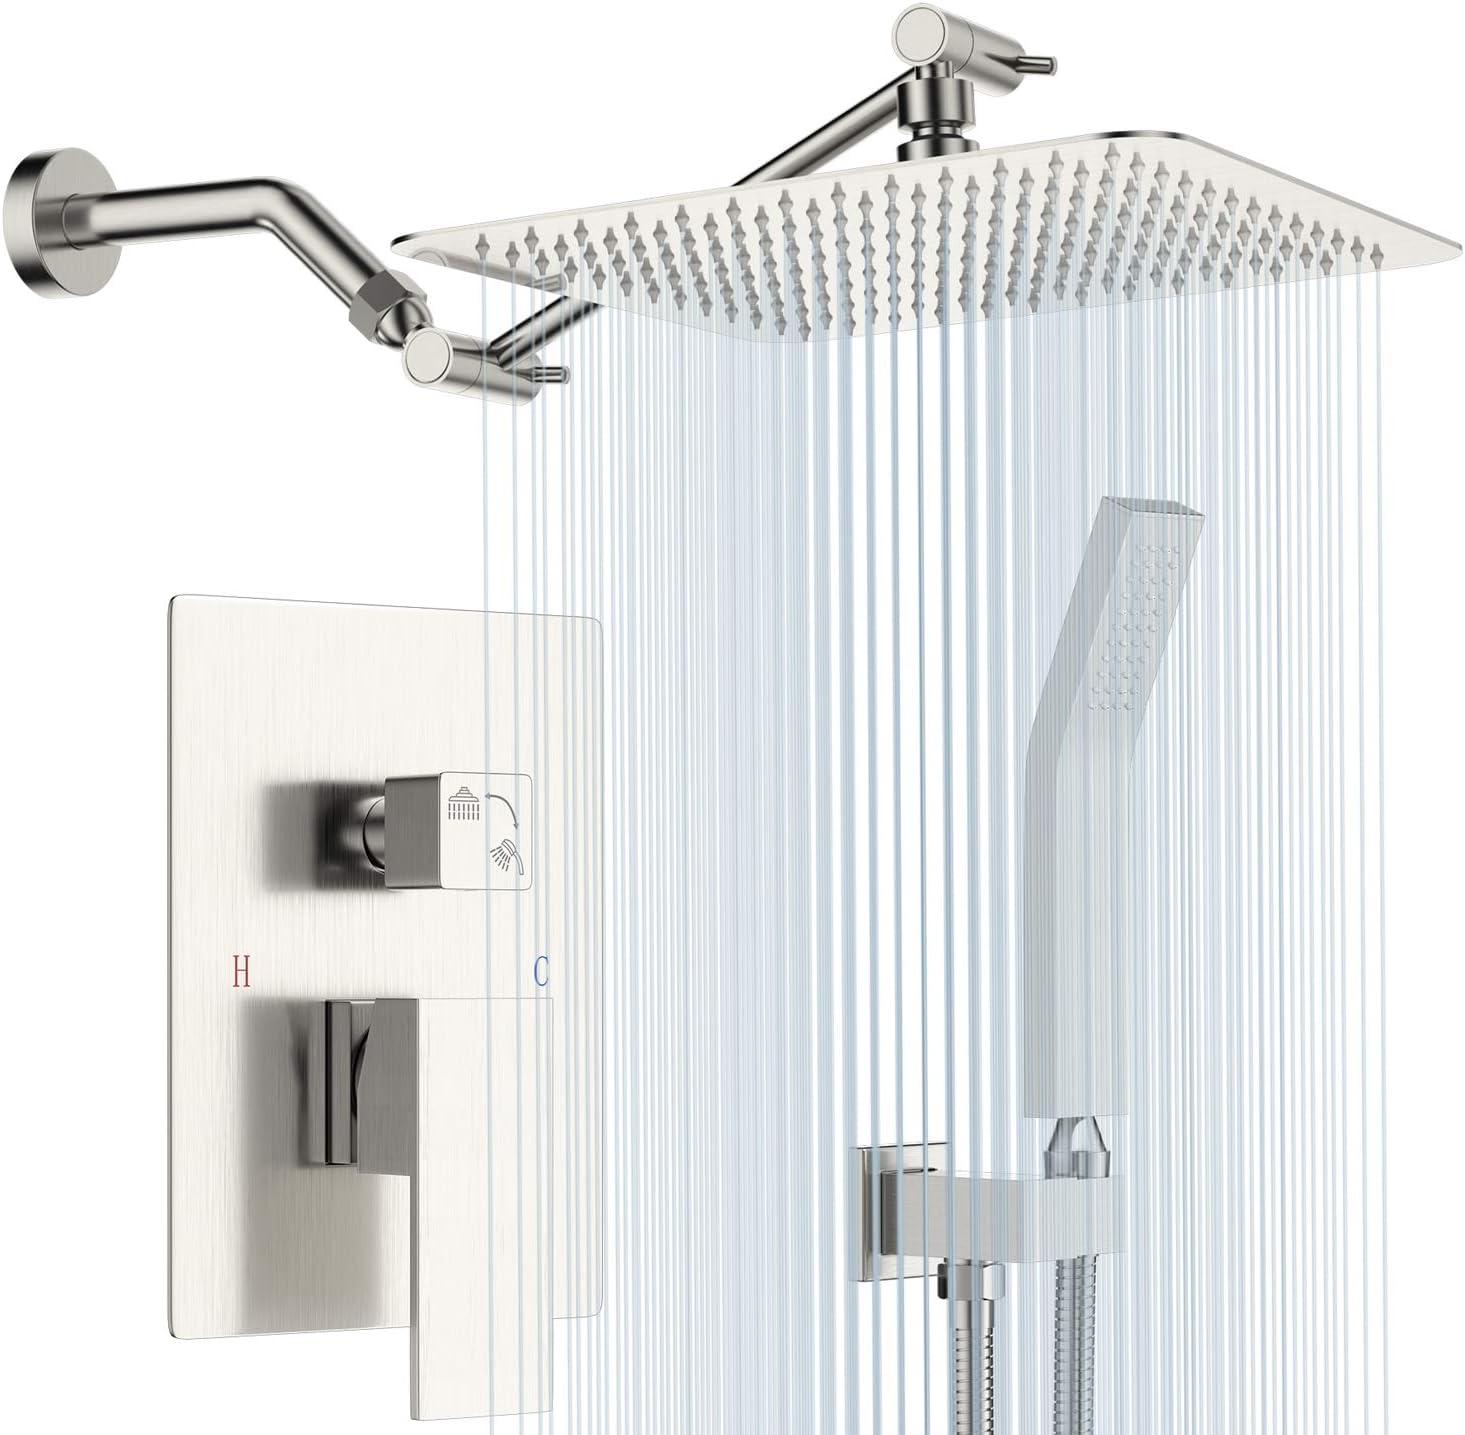 Shower System with Shower Arm Extender, Adjustable Rainfall Shower